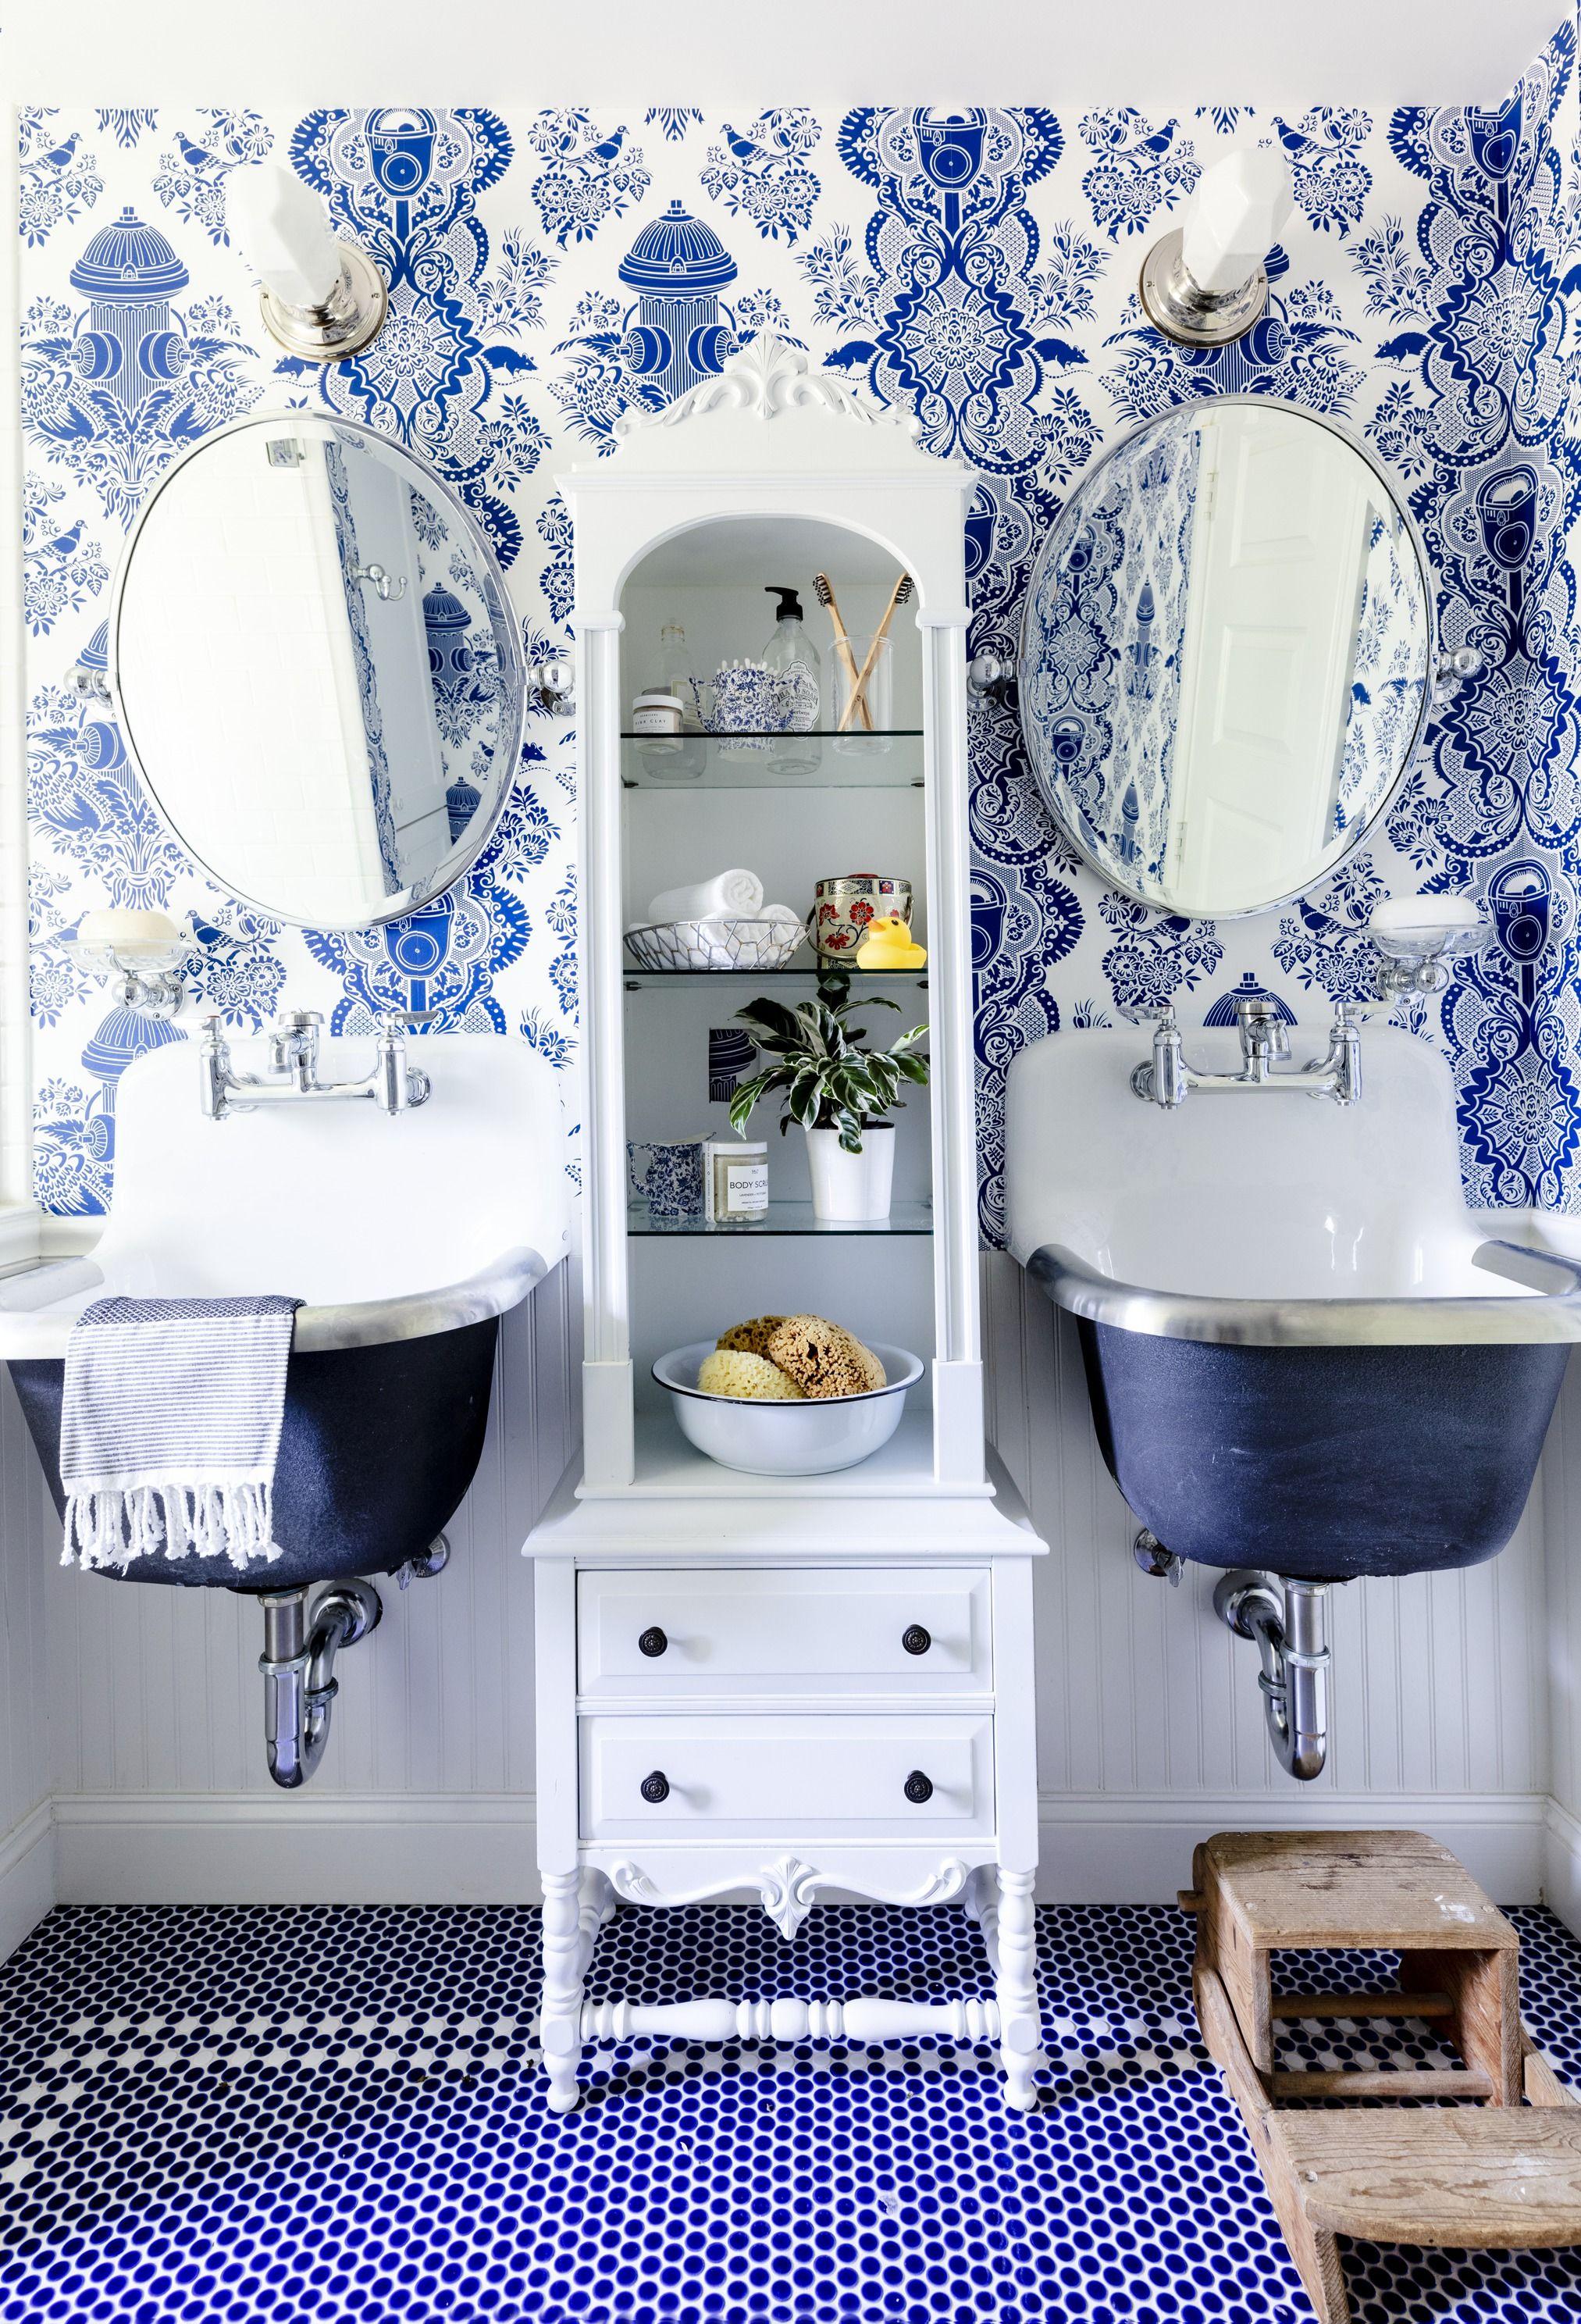 Free download 28 Bathroom Wallpaper Ideas Best Wallpapers ...